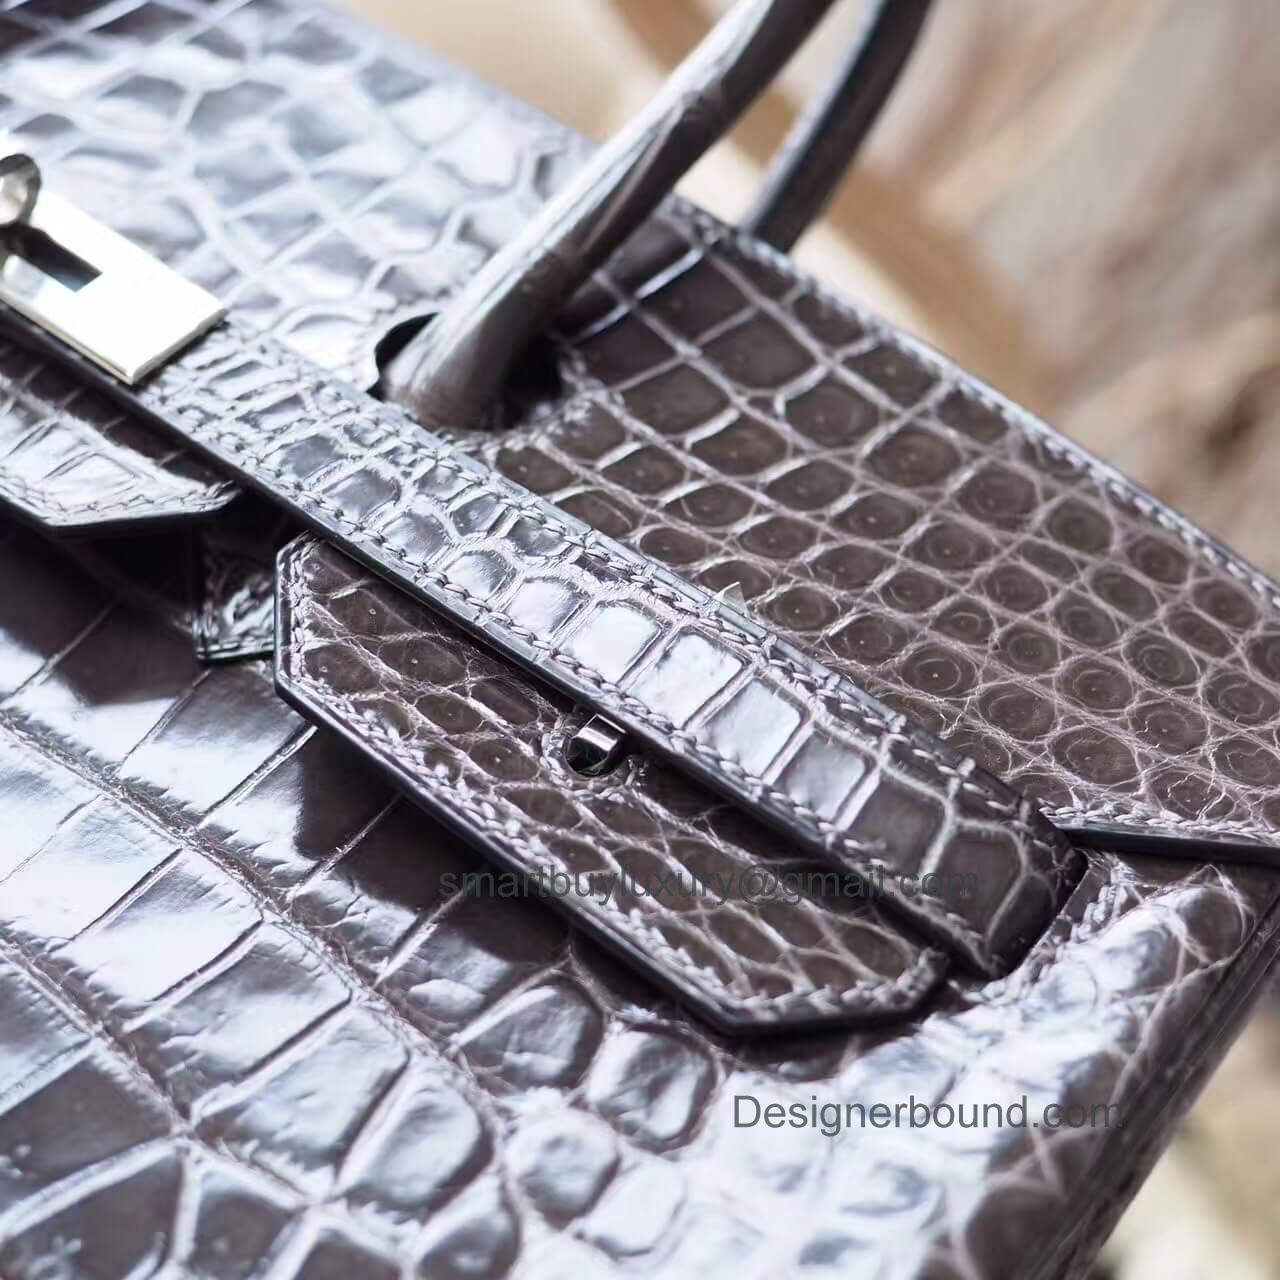 5d2aa320bbb2 Hermes Birkin 35 Bag in cc88 Graphite Shiny Porosus Croc PHW. HERMES ...